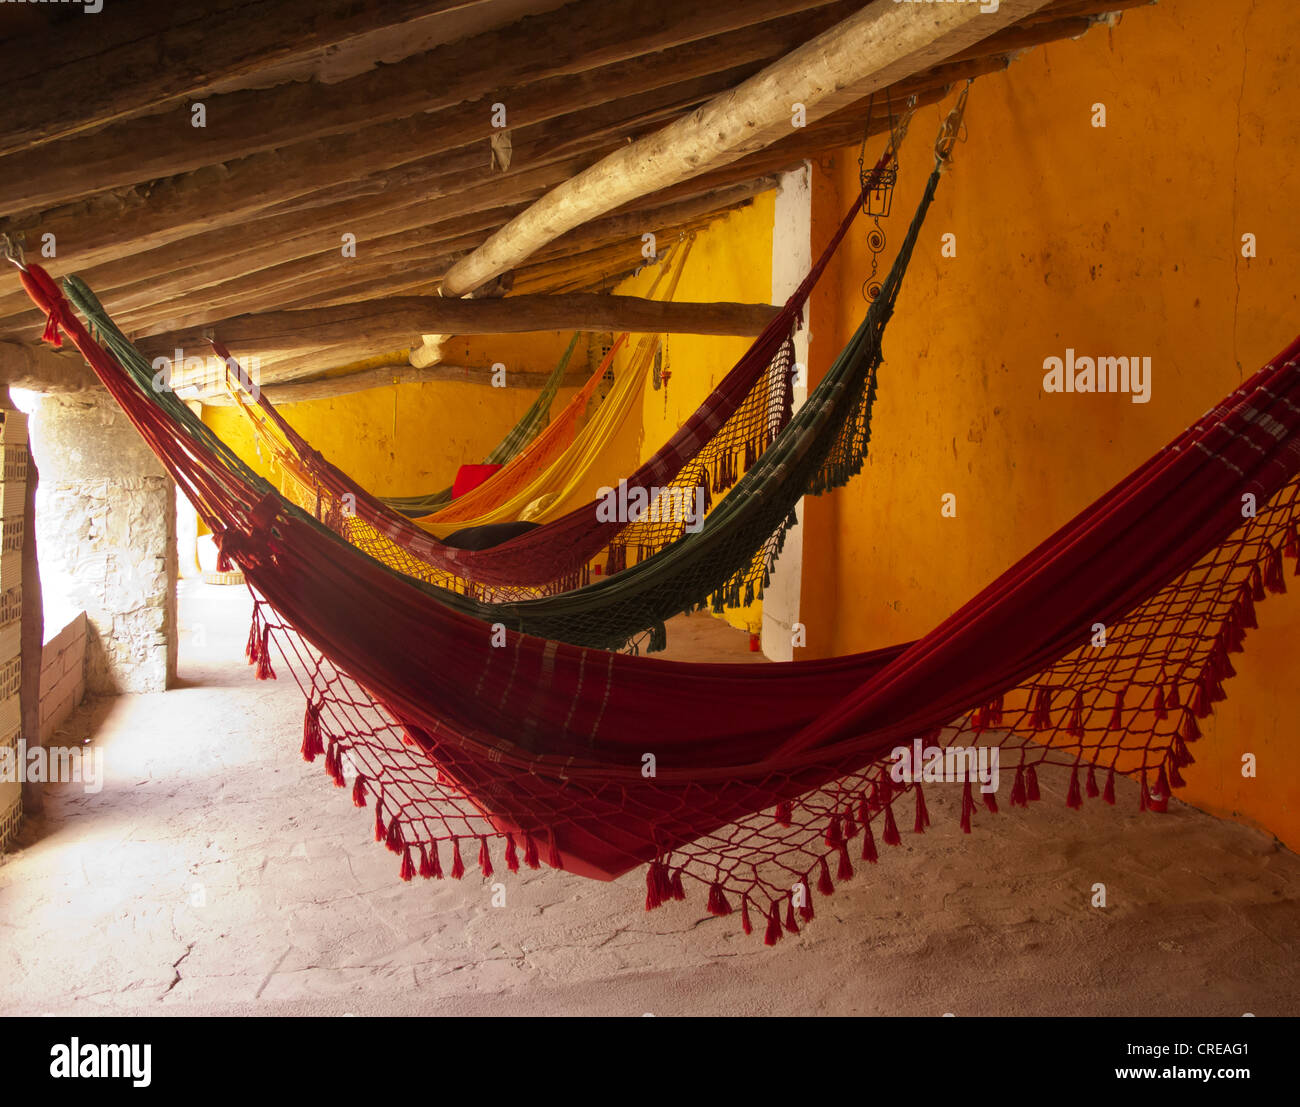 Spain: hammocks hanging in an outdoor terrace - Stock Image